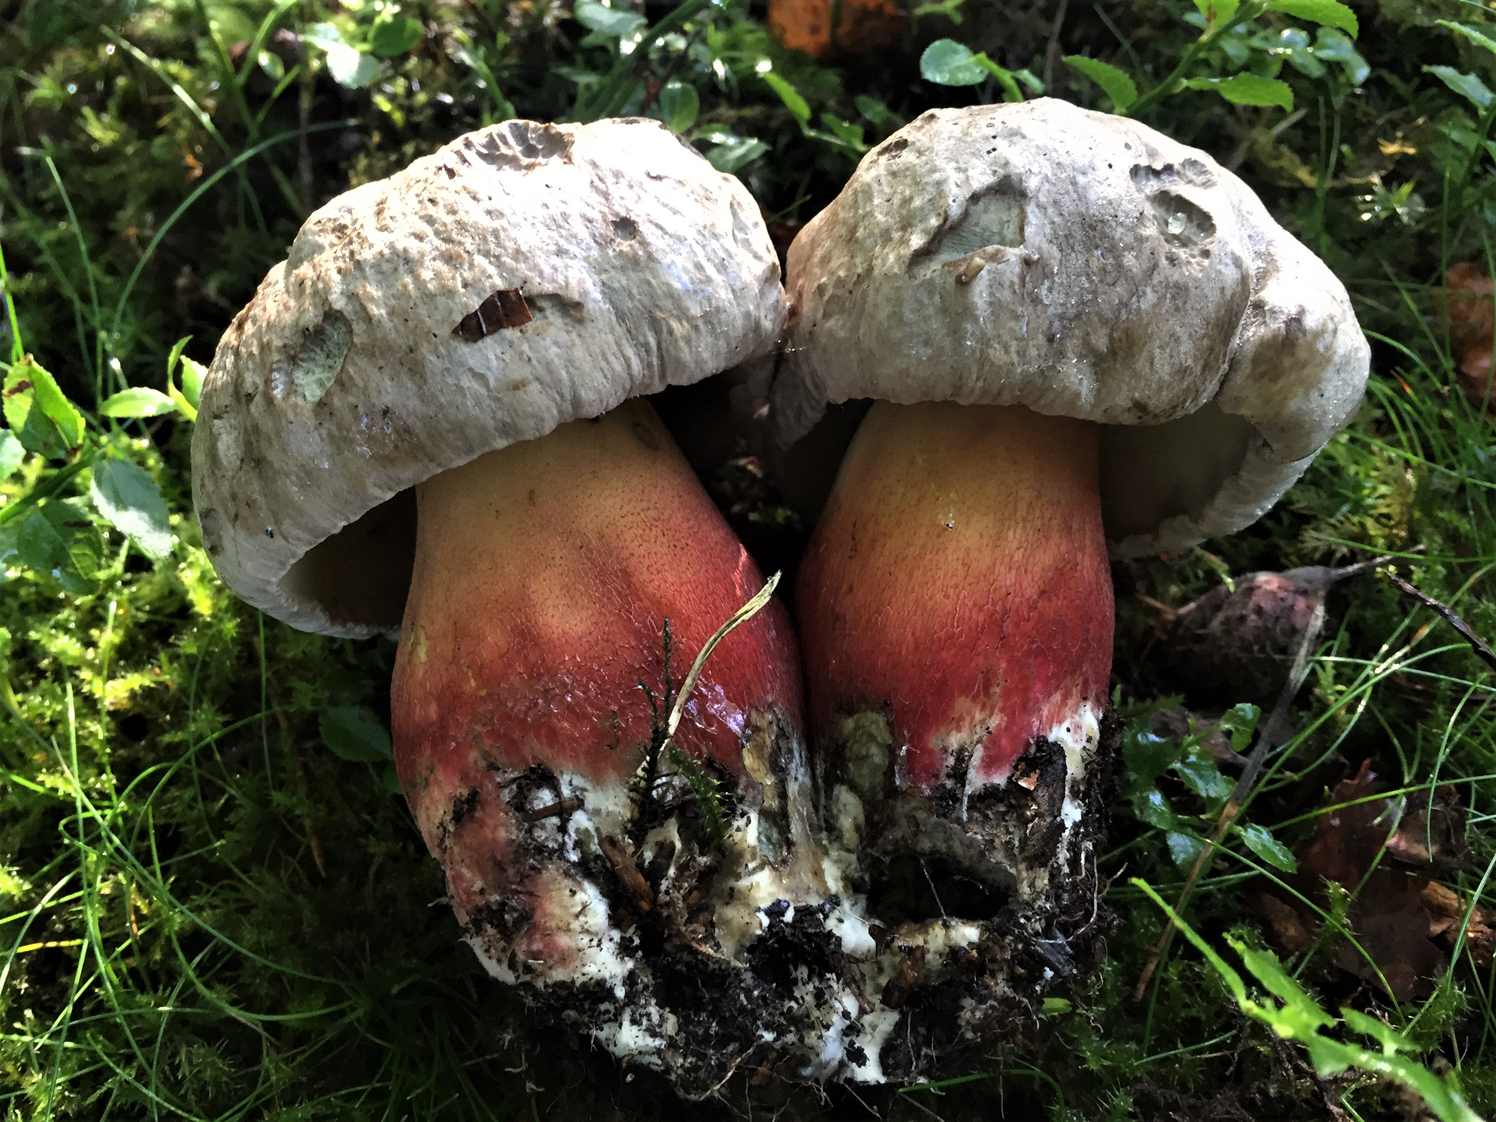 Bitter - mushroom edible or not